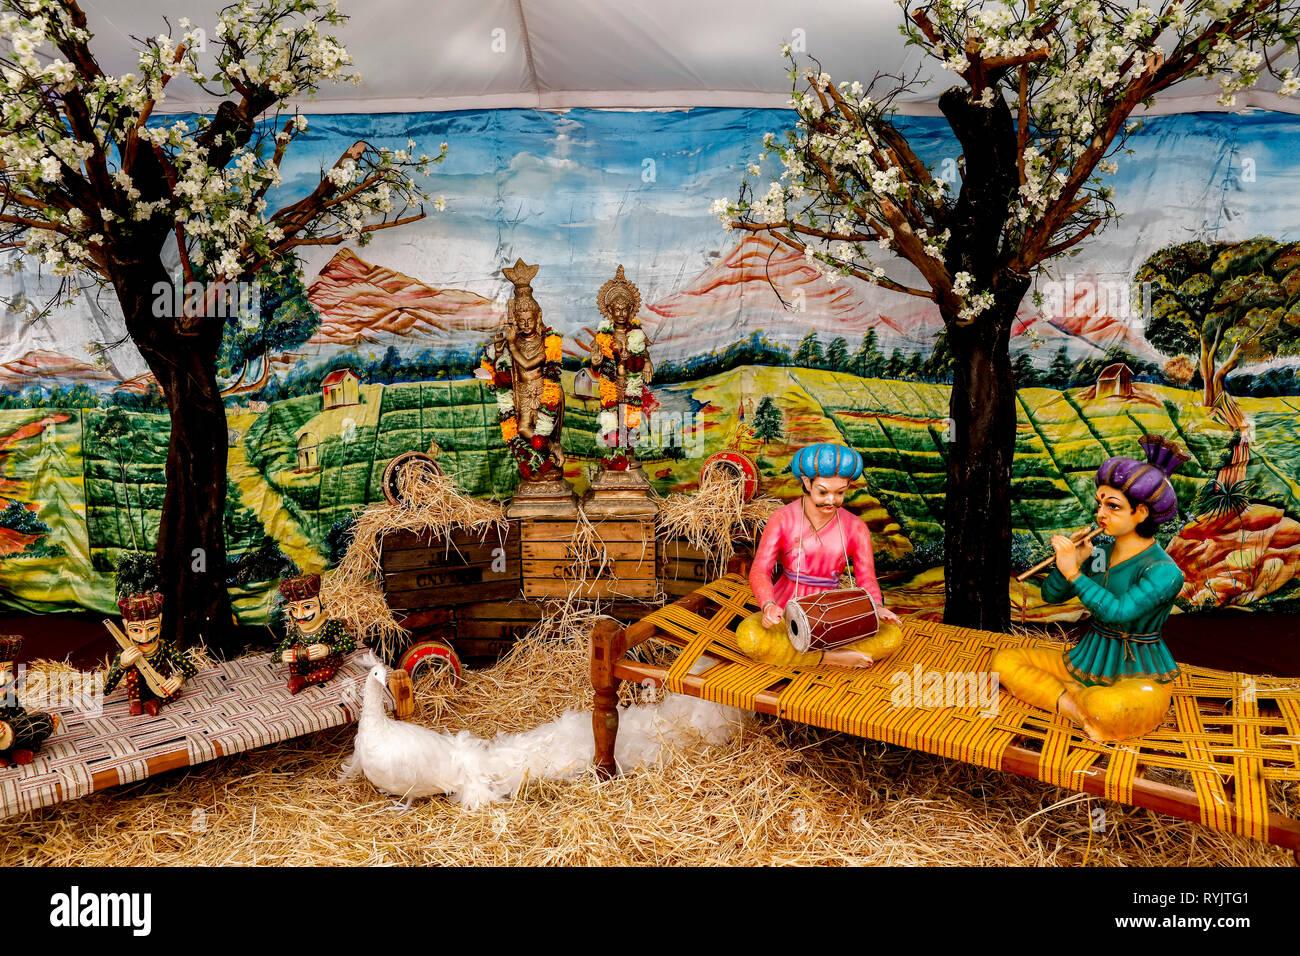 Janmashtami festival at Bhaktivedanta Manor, Watford, U.K. Statues in the guests' tent. - Stock Image